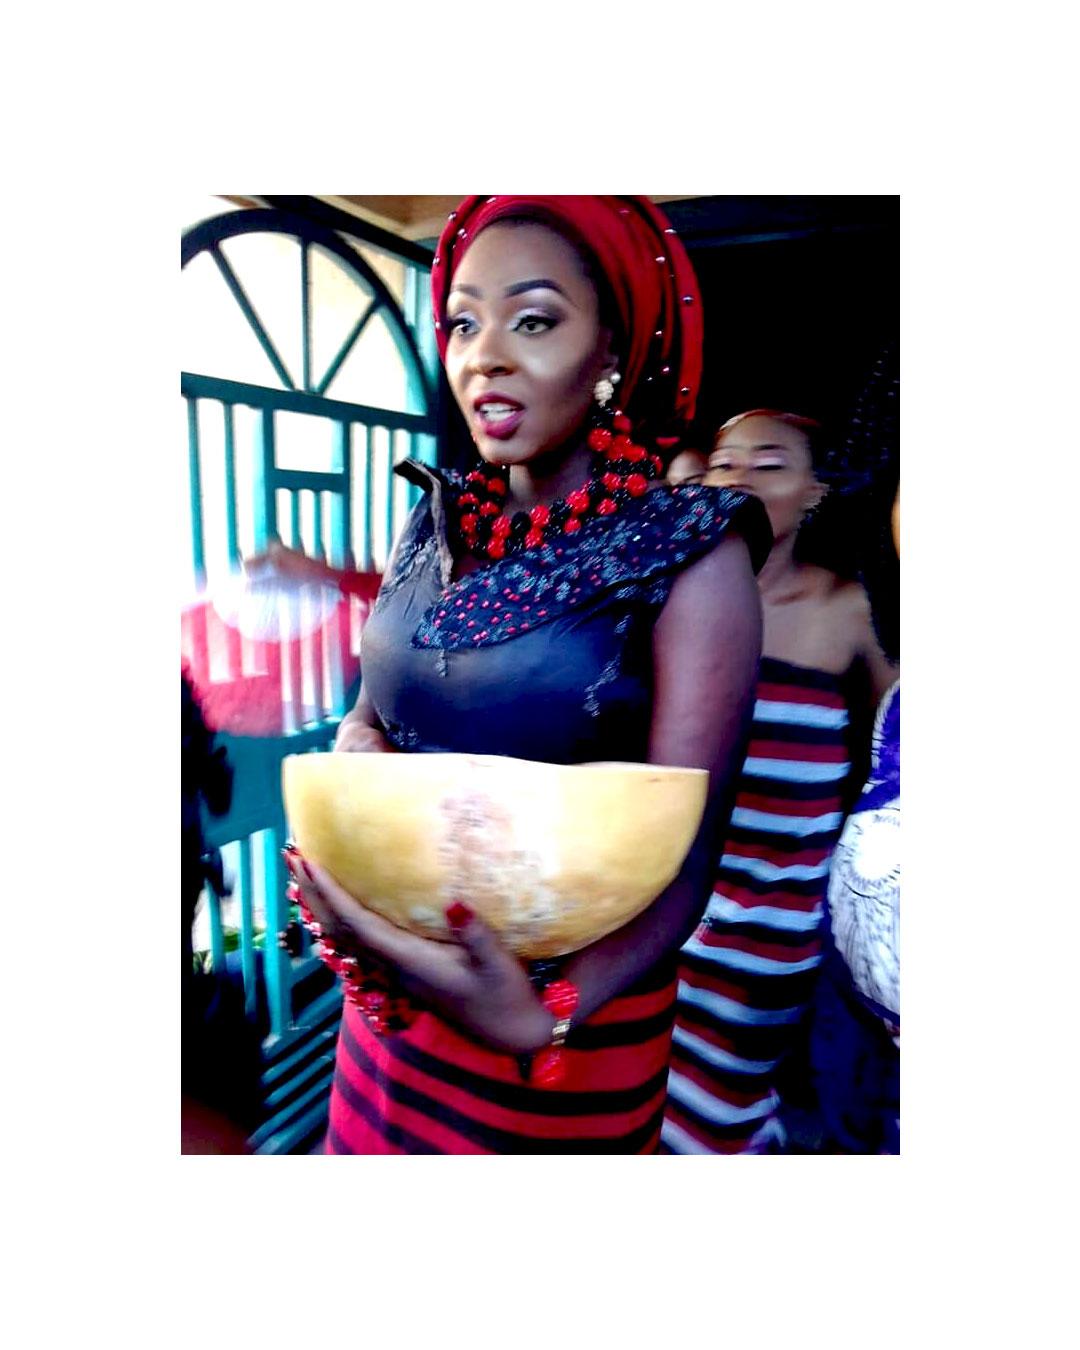 Kakra Adole, Editor I am Benue © I am Benue 2019